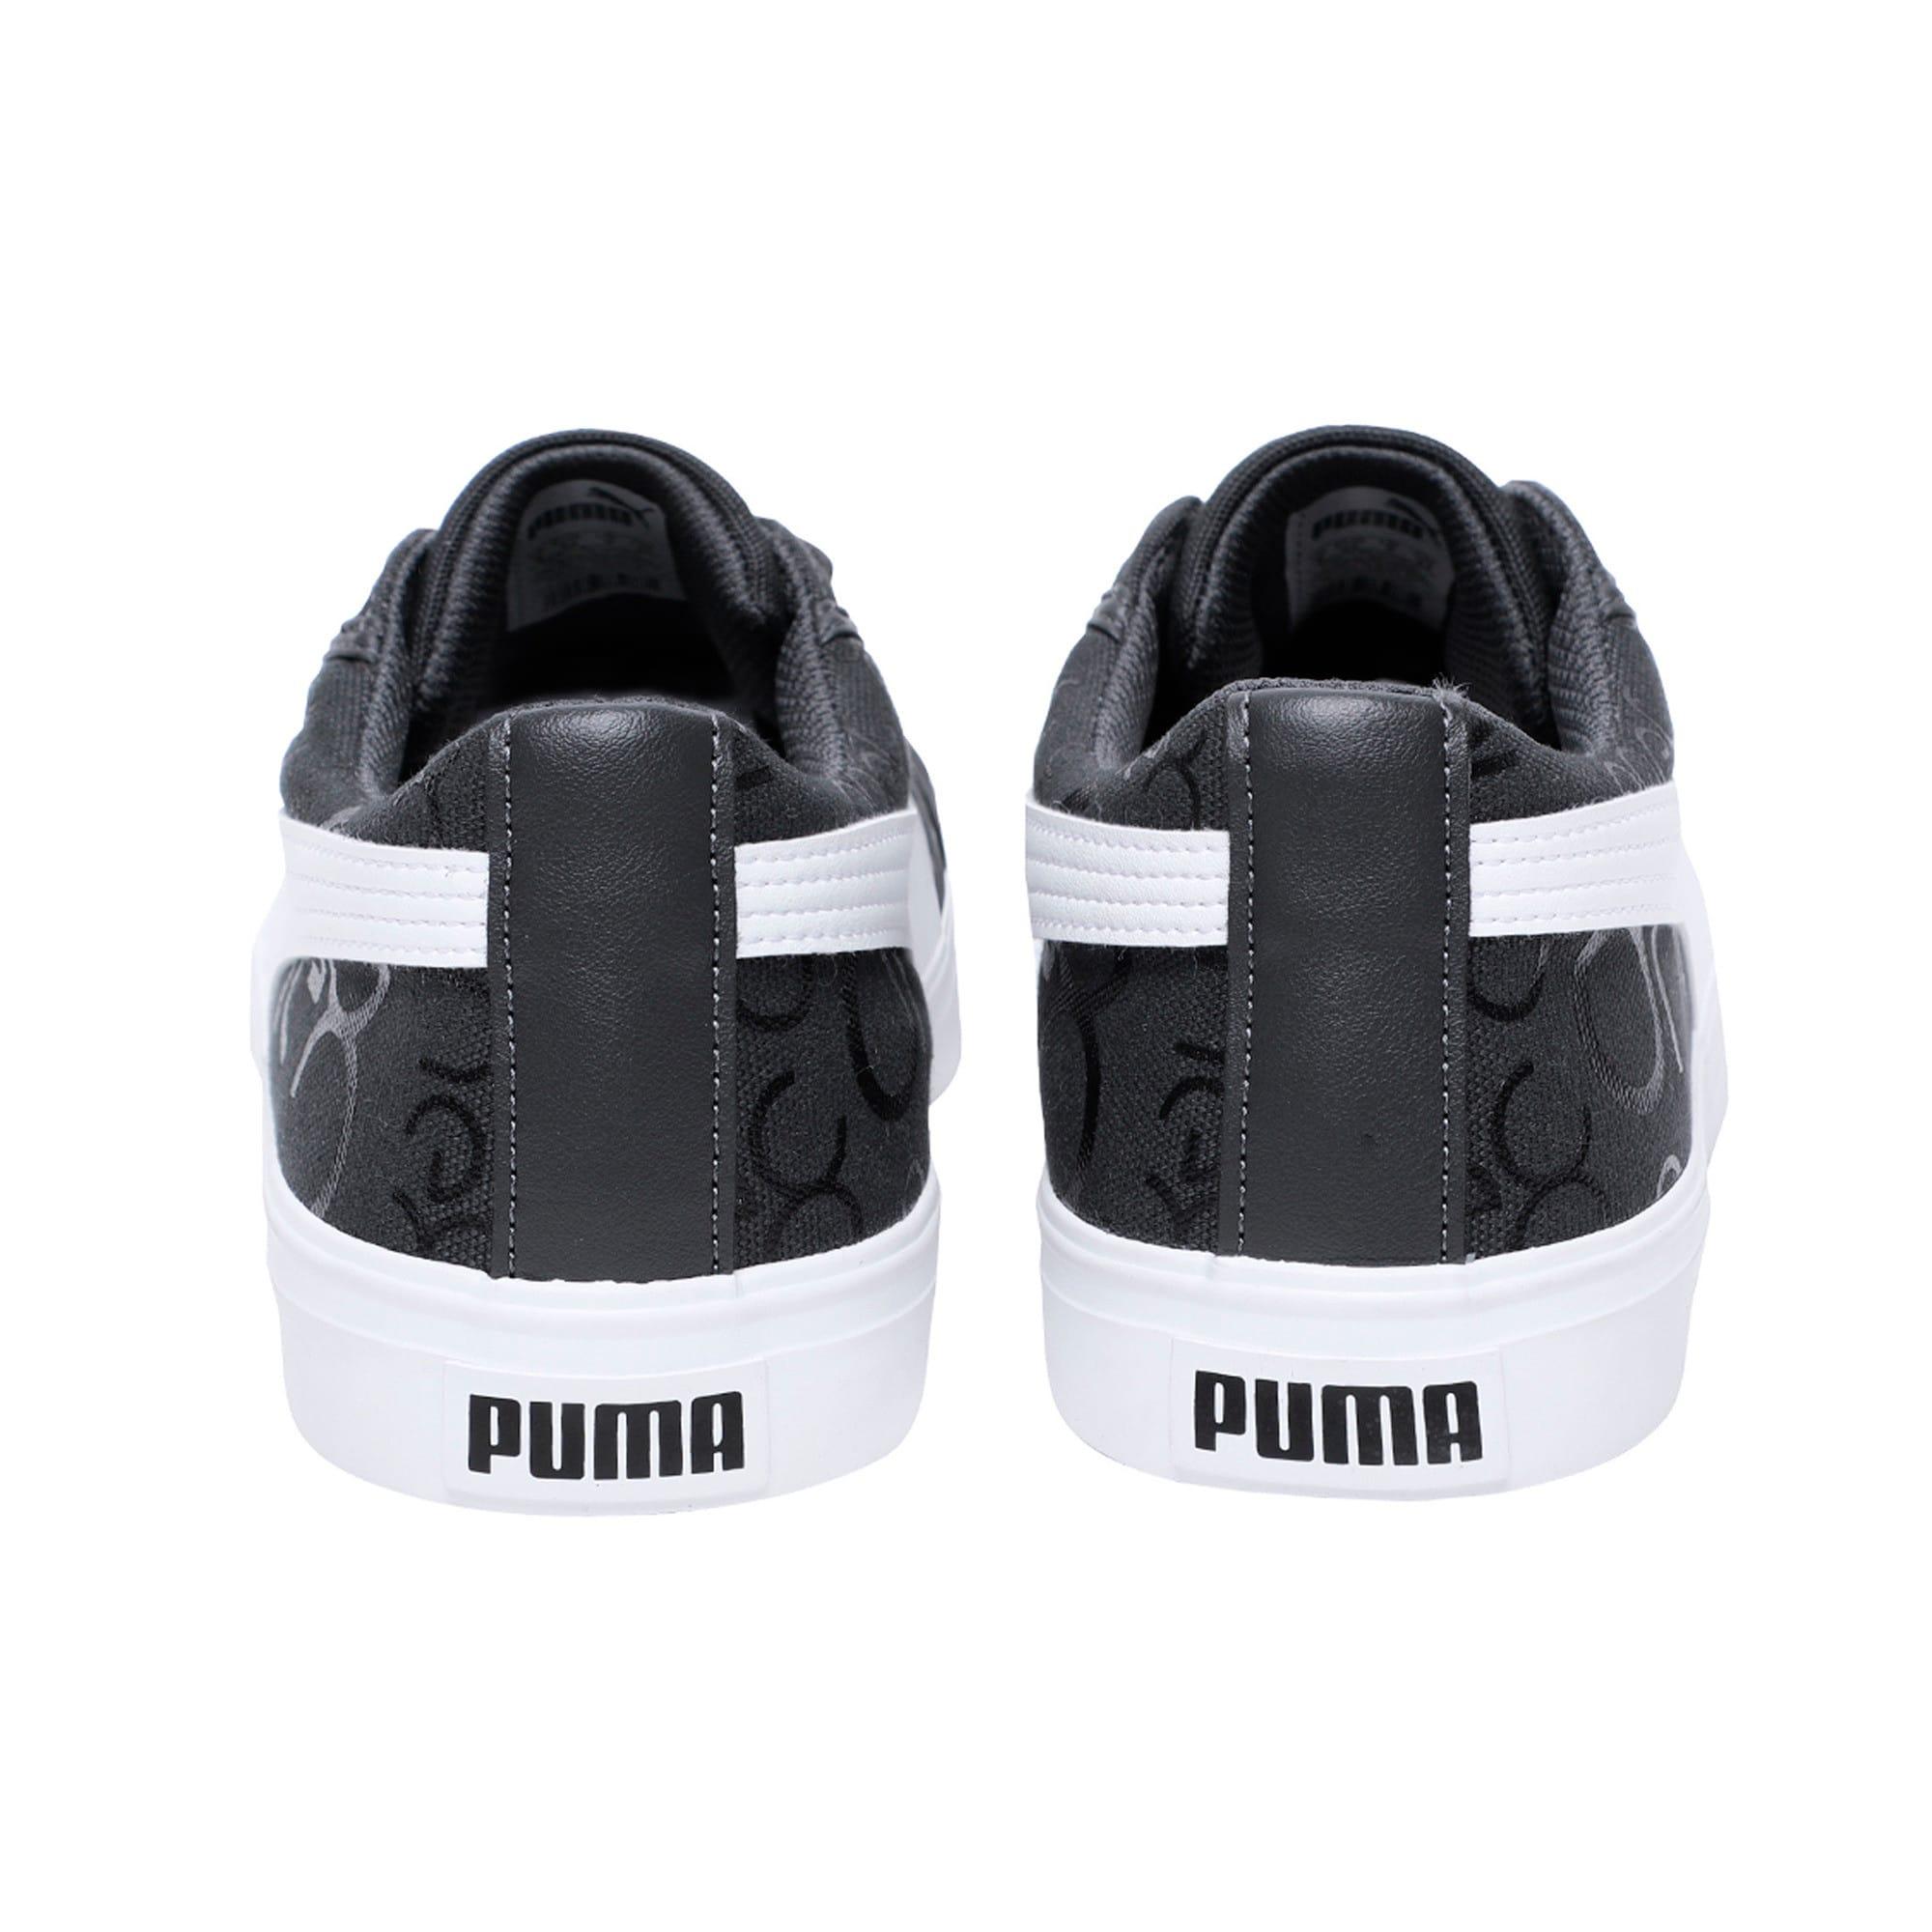 Thumbnail 3 of one8 Men's Sneakers, Iron Gate-Puma White-Black, medium-IND